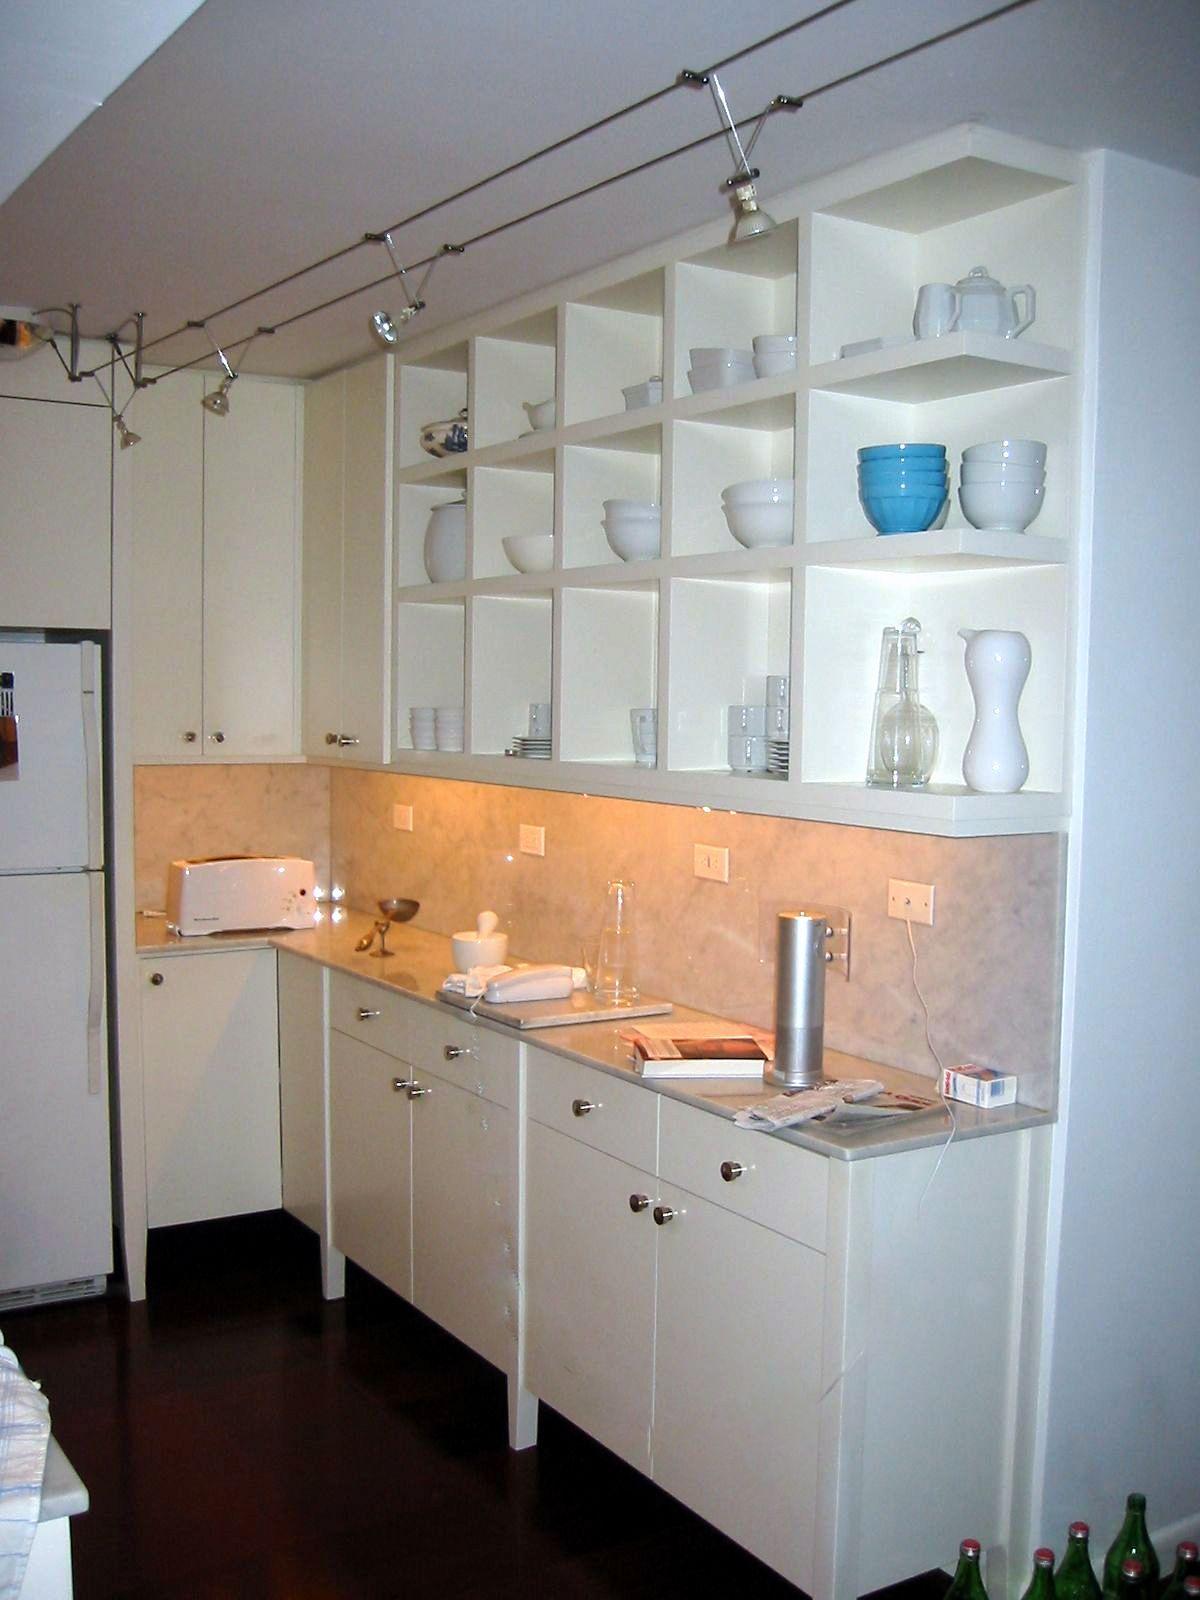 Kitchens-127.jpg